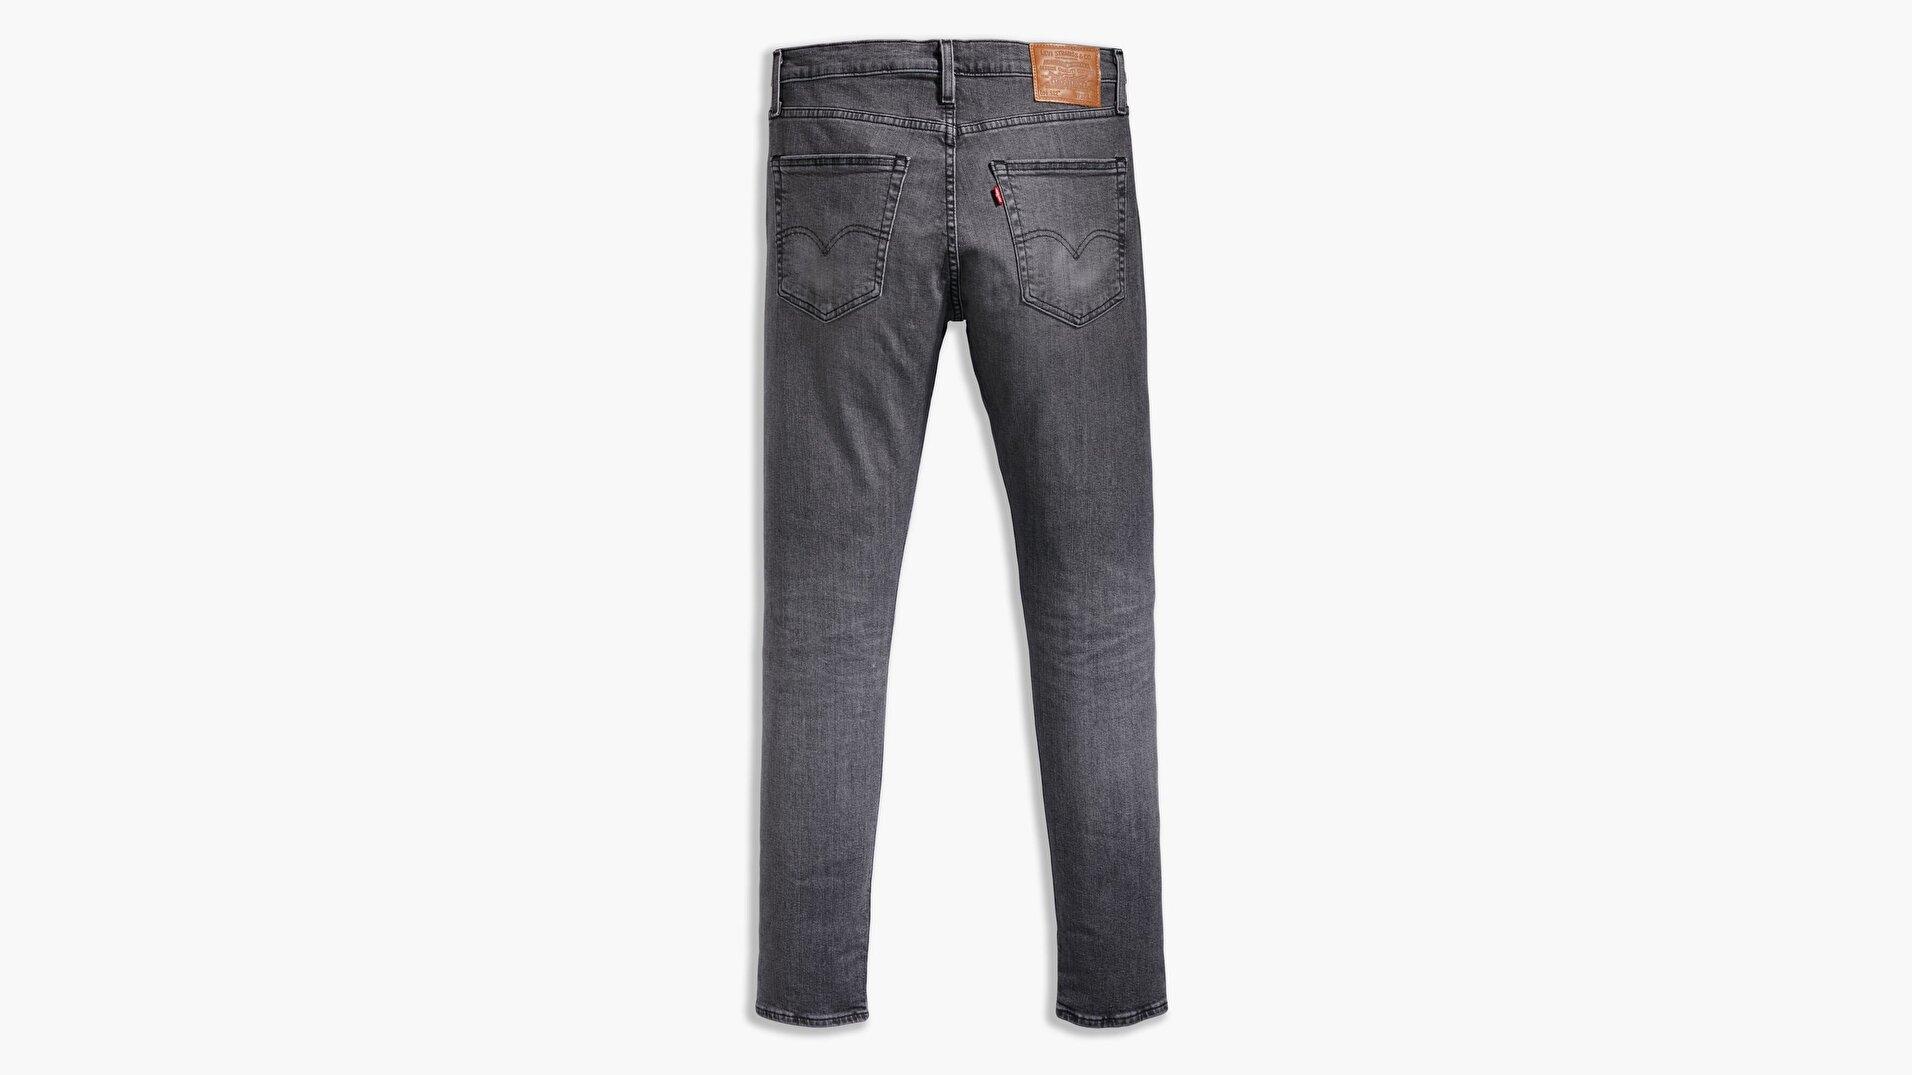 512™ Slim Taper Erkek Jean Pantolon-Richmond